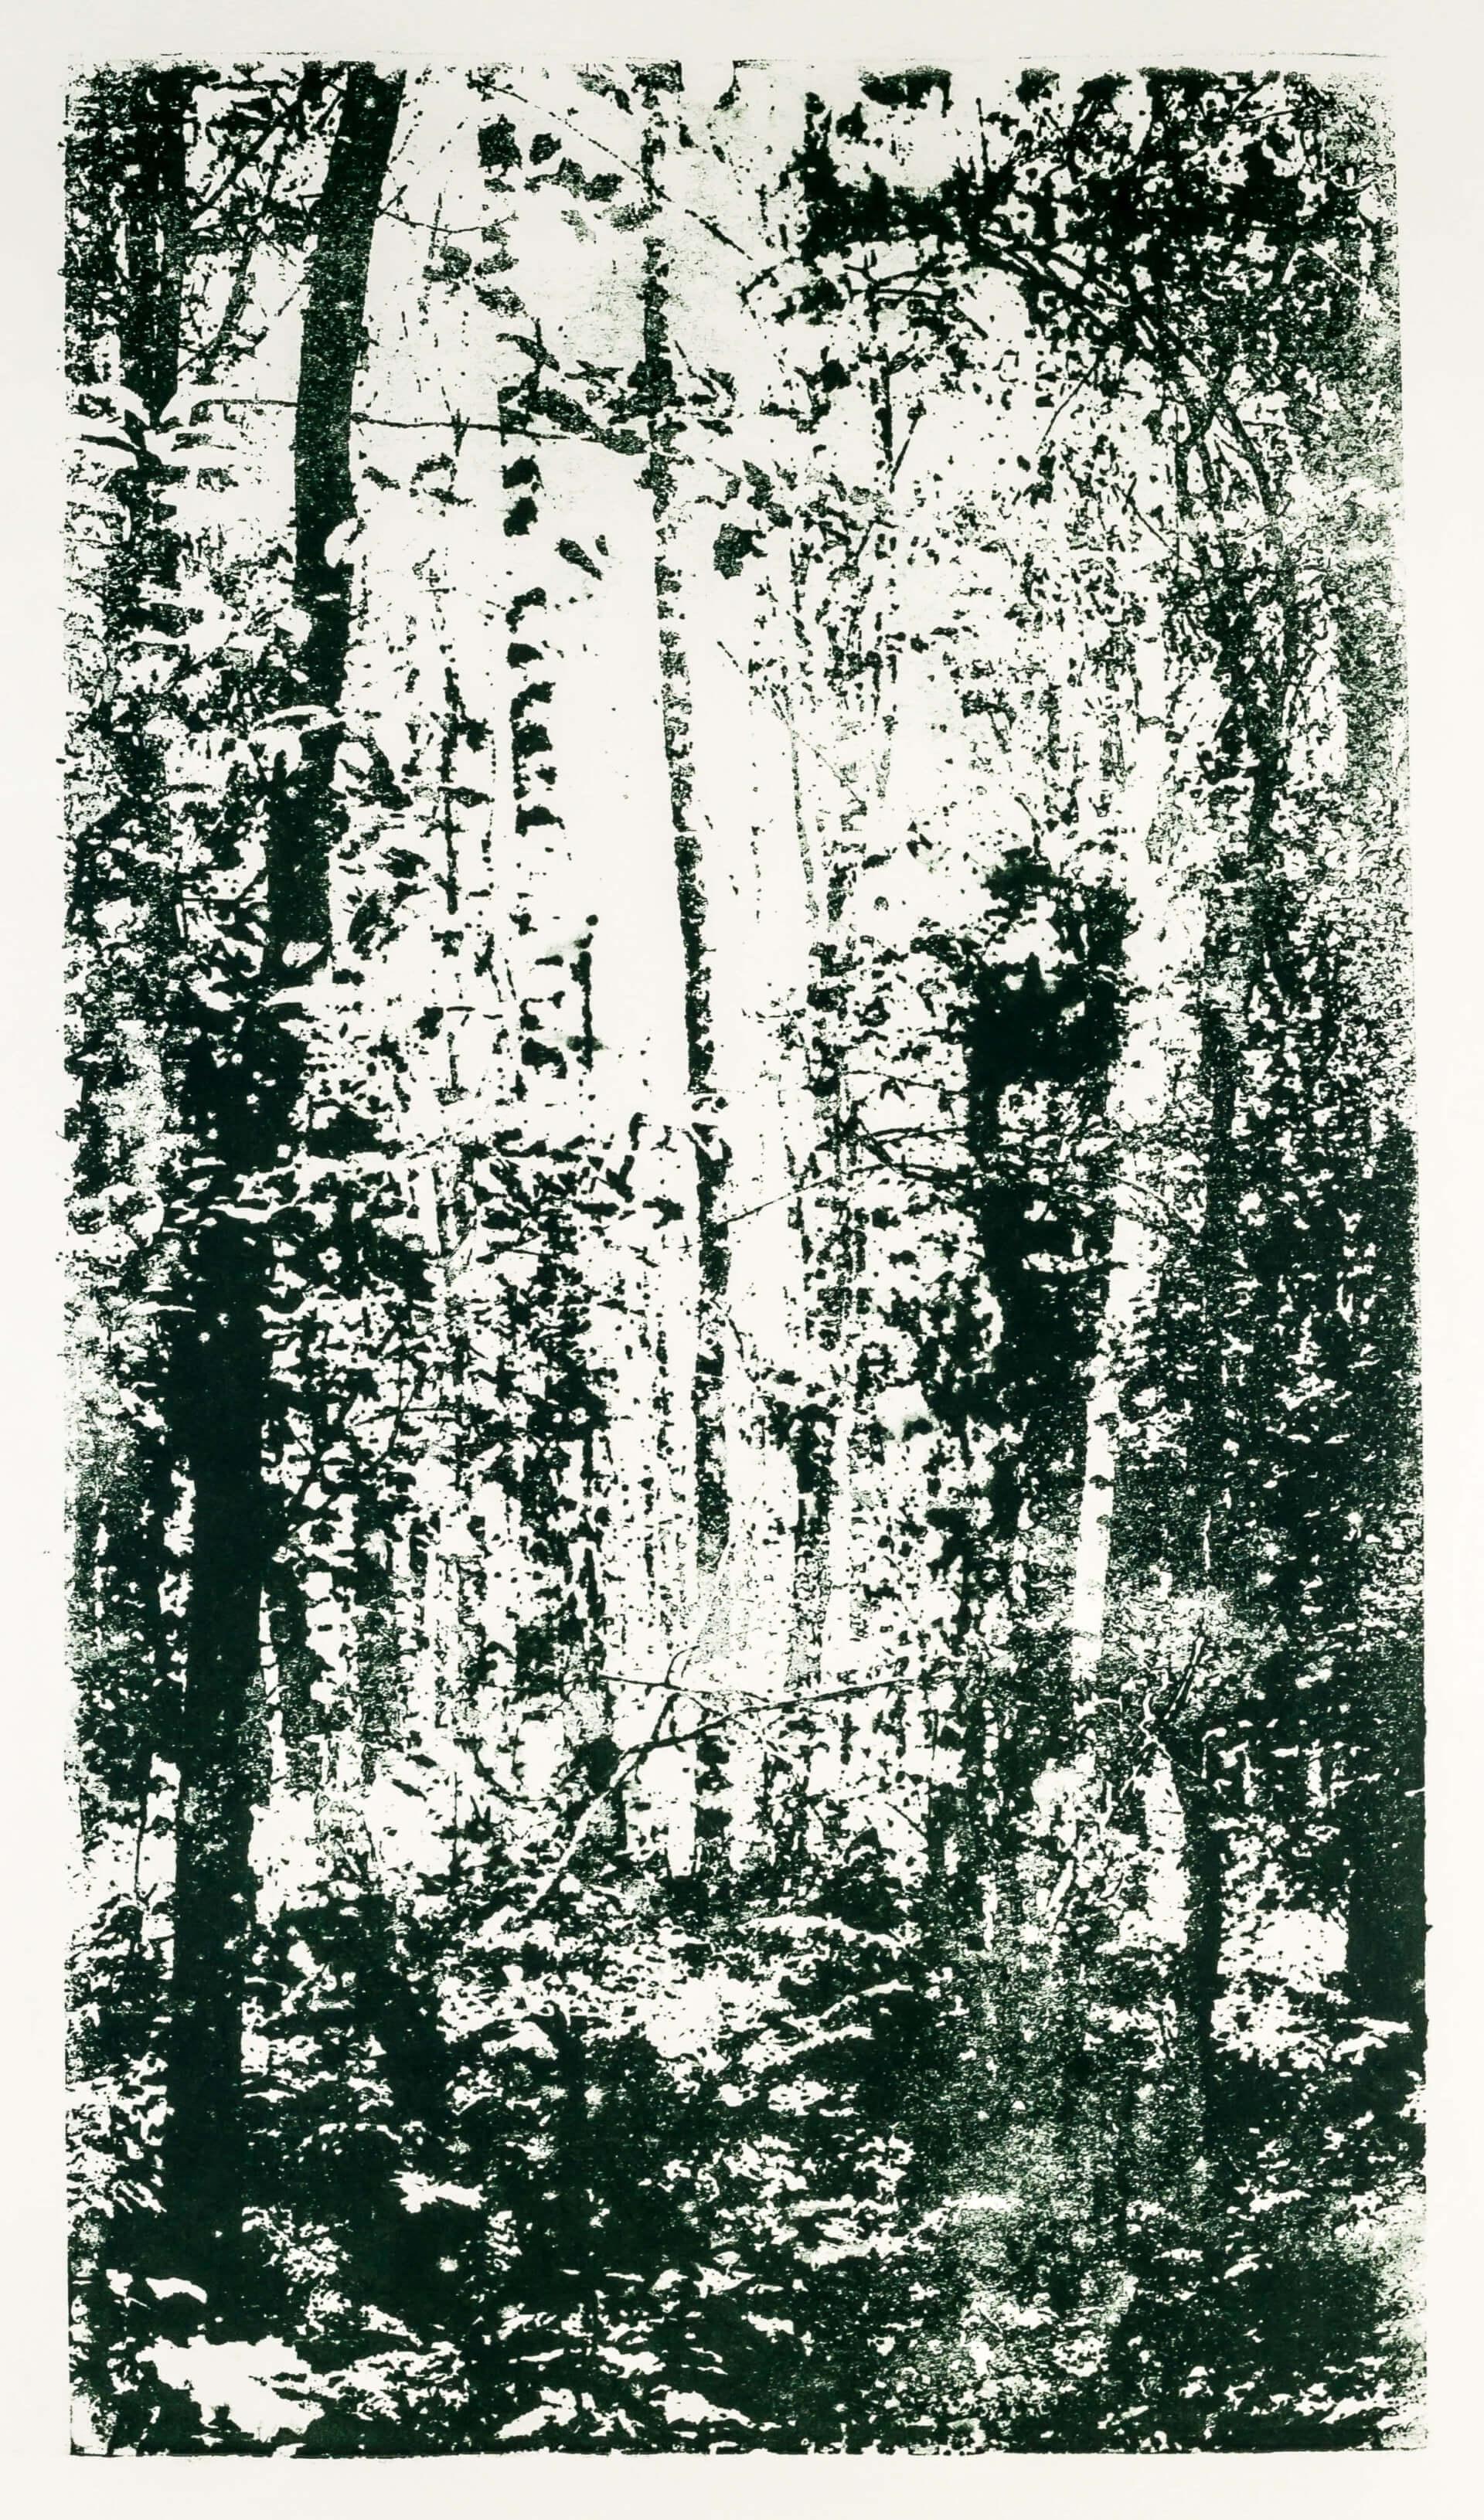 Katharina Albers, Wald XX.I-I, 2015, Farblithographie, Unikat, 60×33 cm